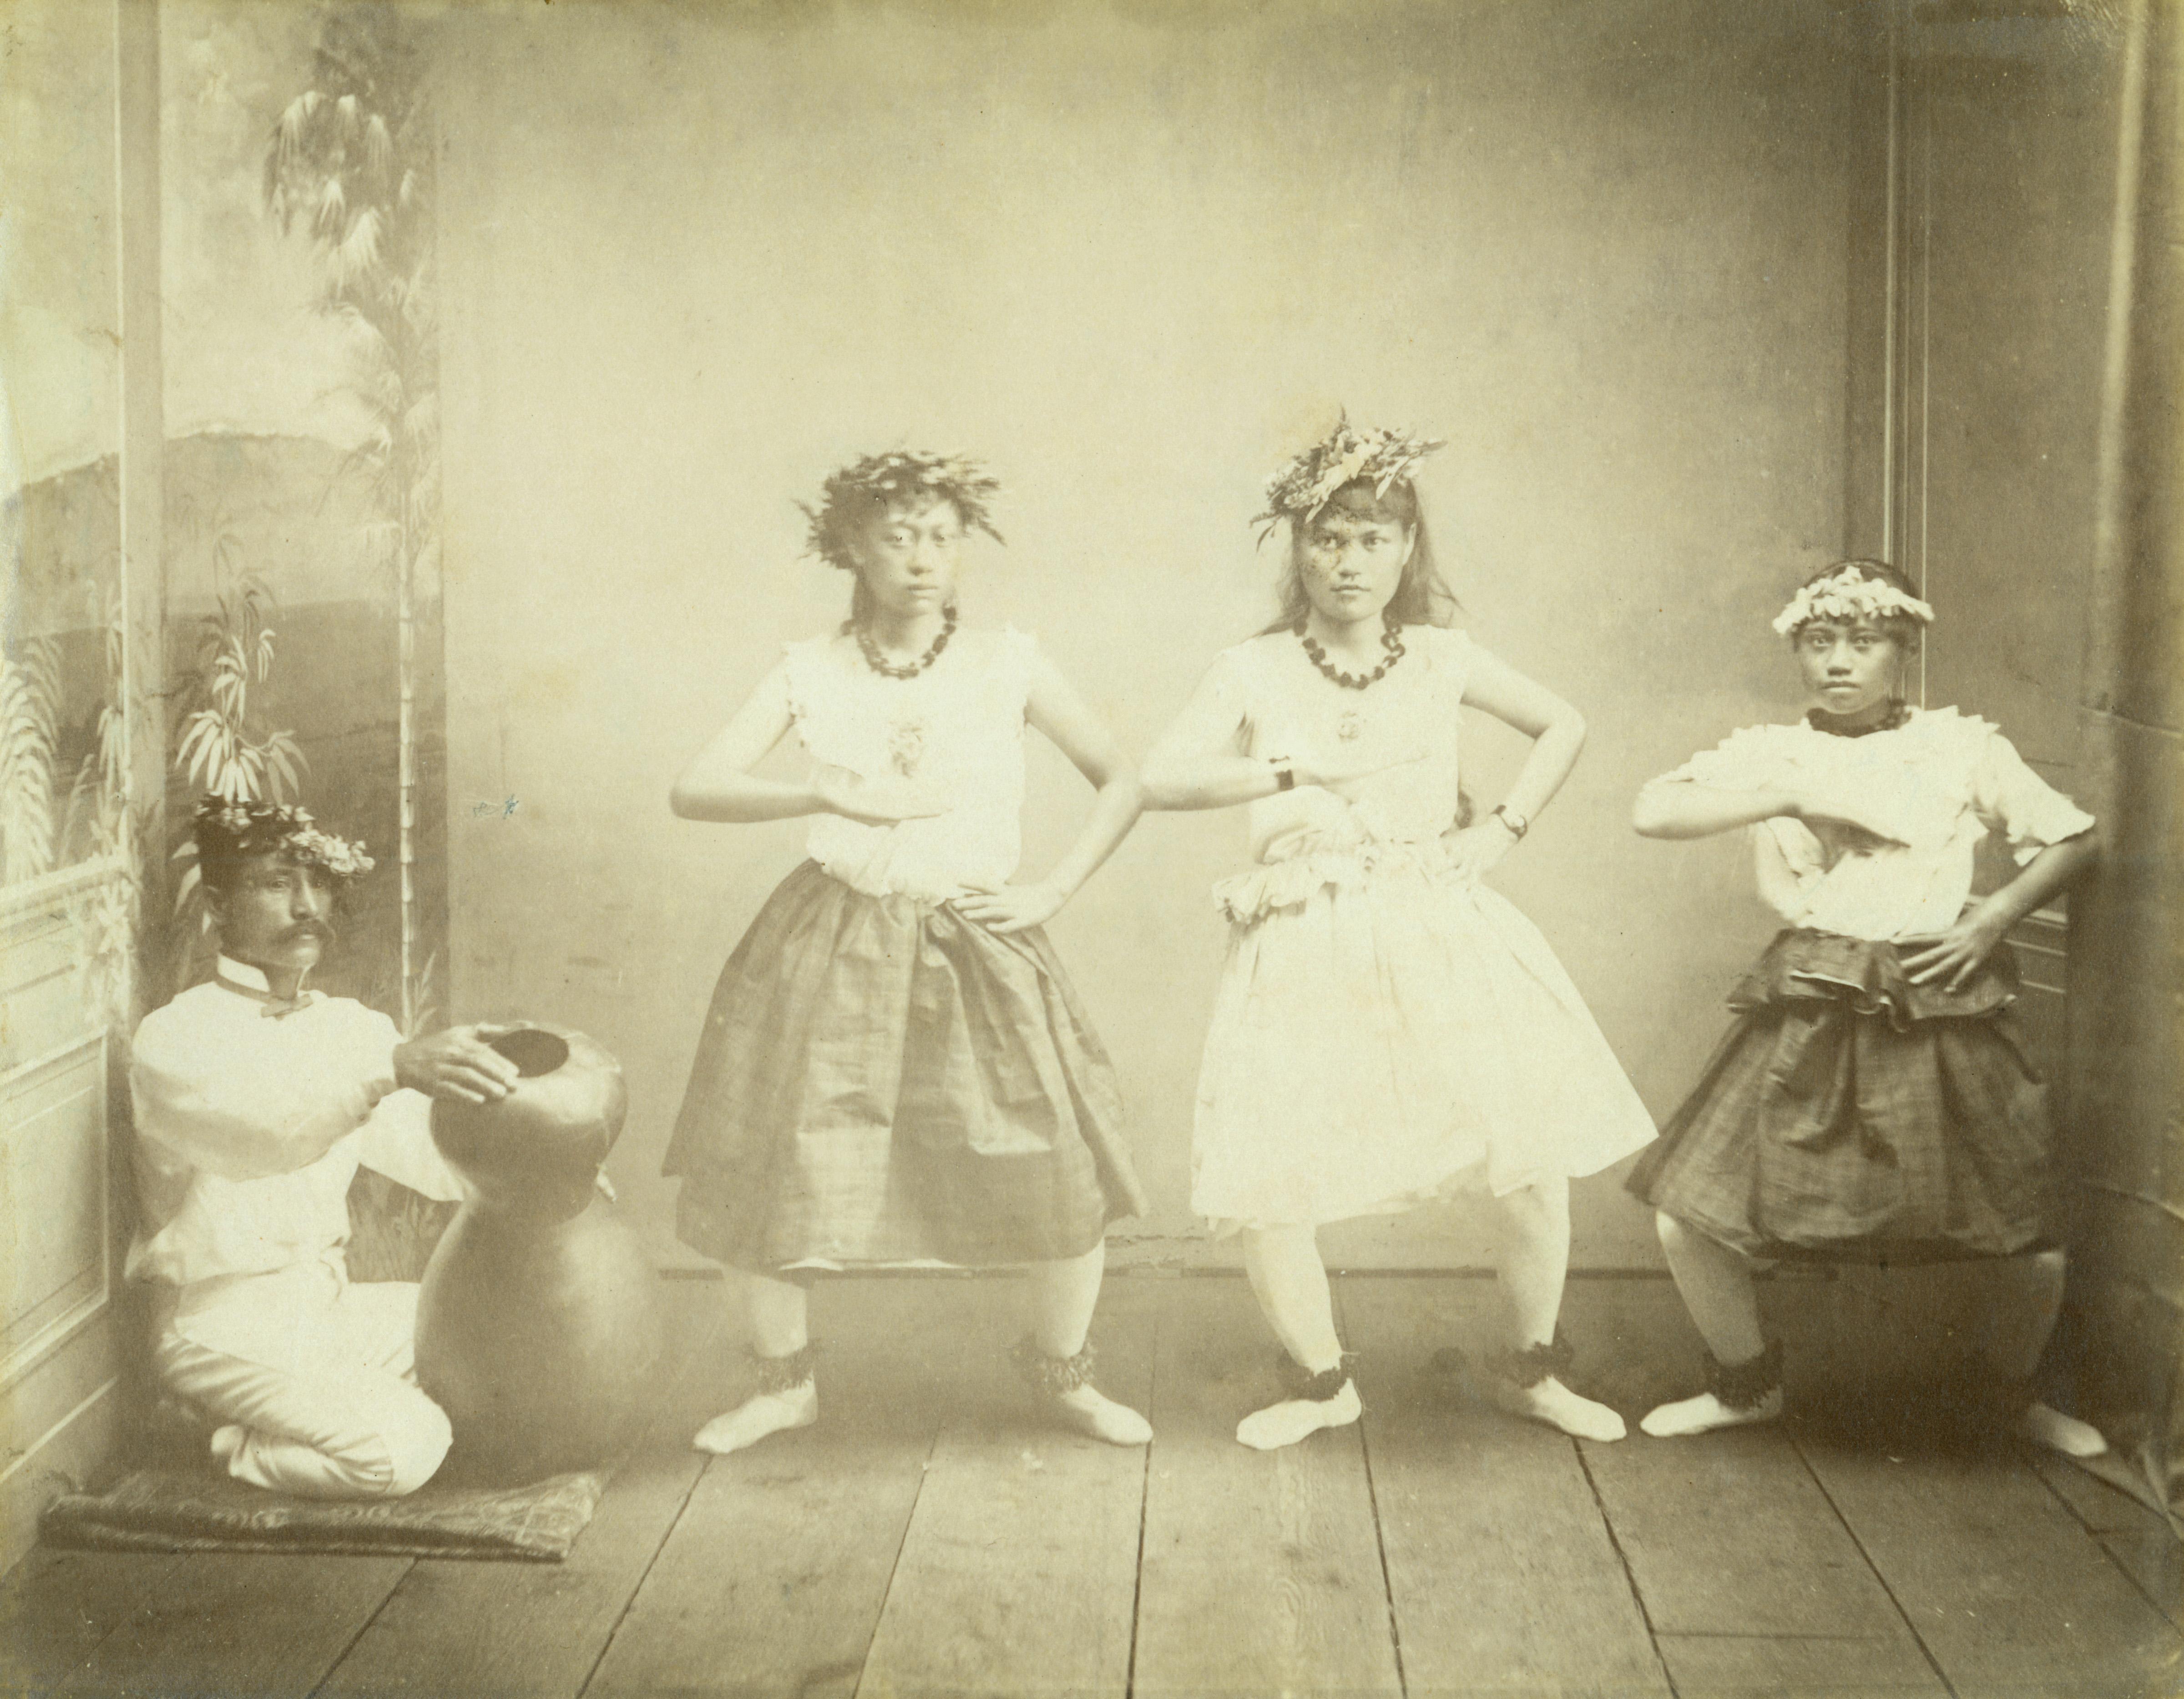 [Hula dancers and chanter] Hawaiʻi, ca. 1880. Photo by H. L. Chase.